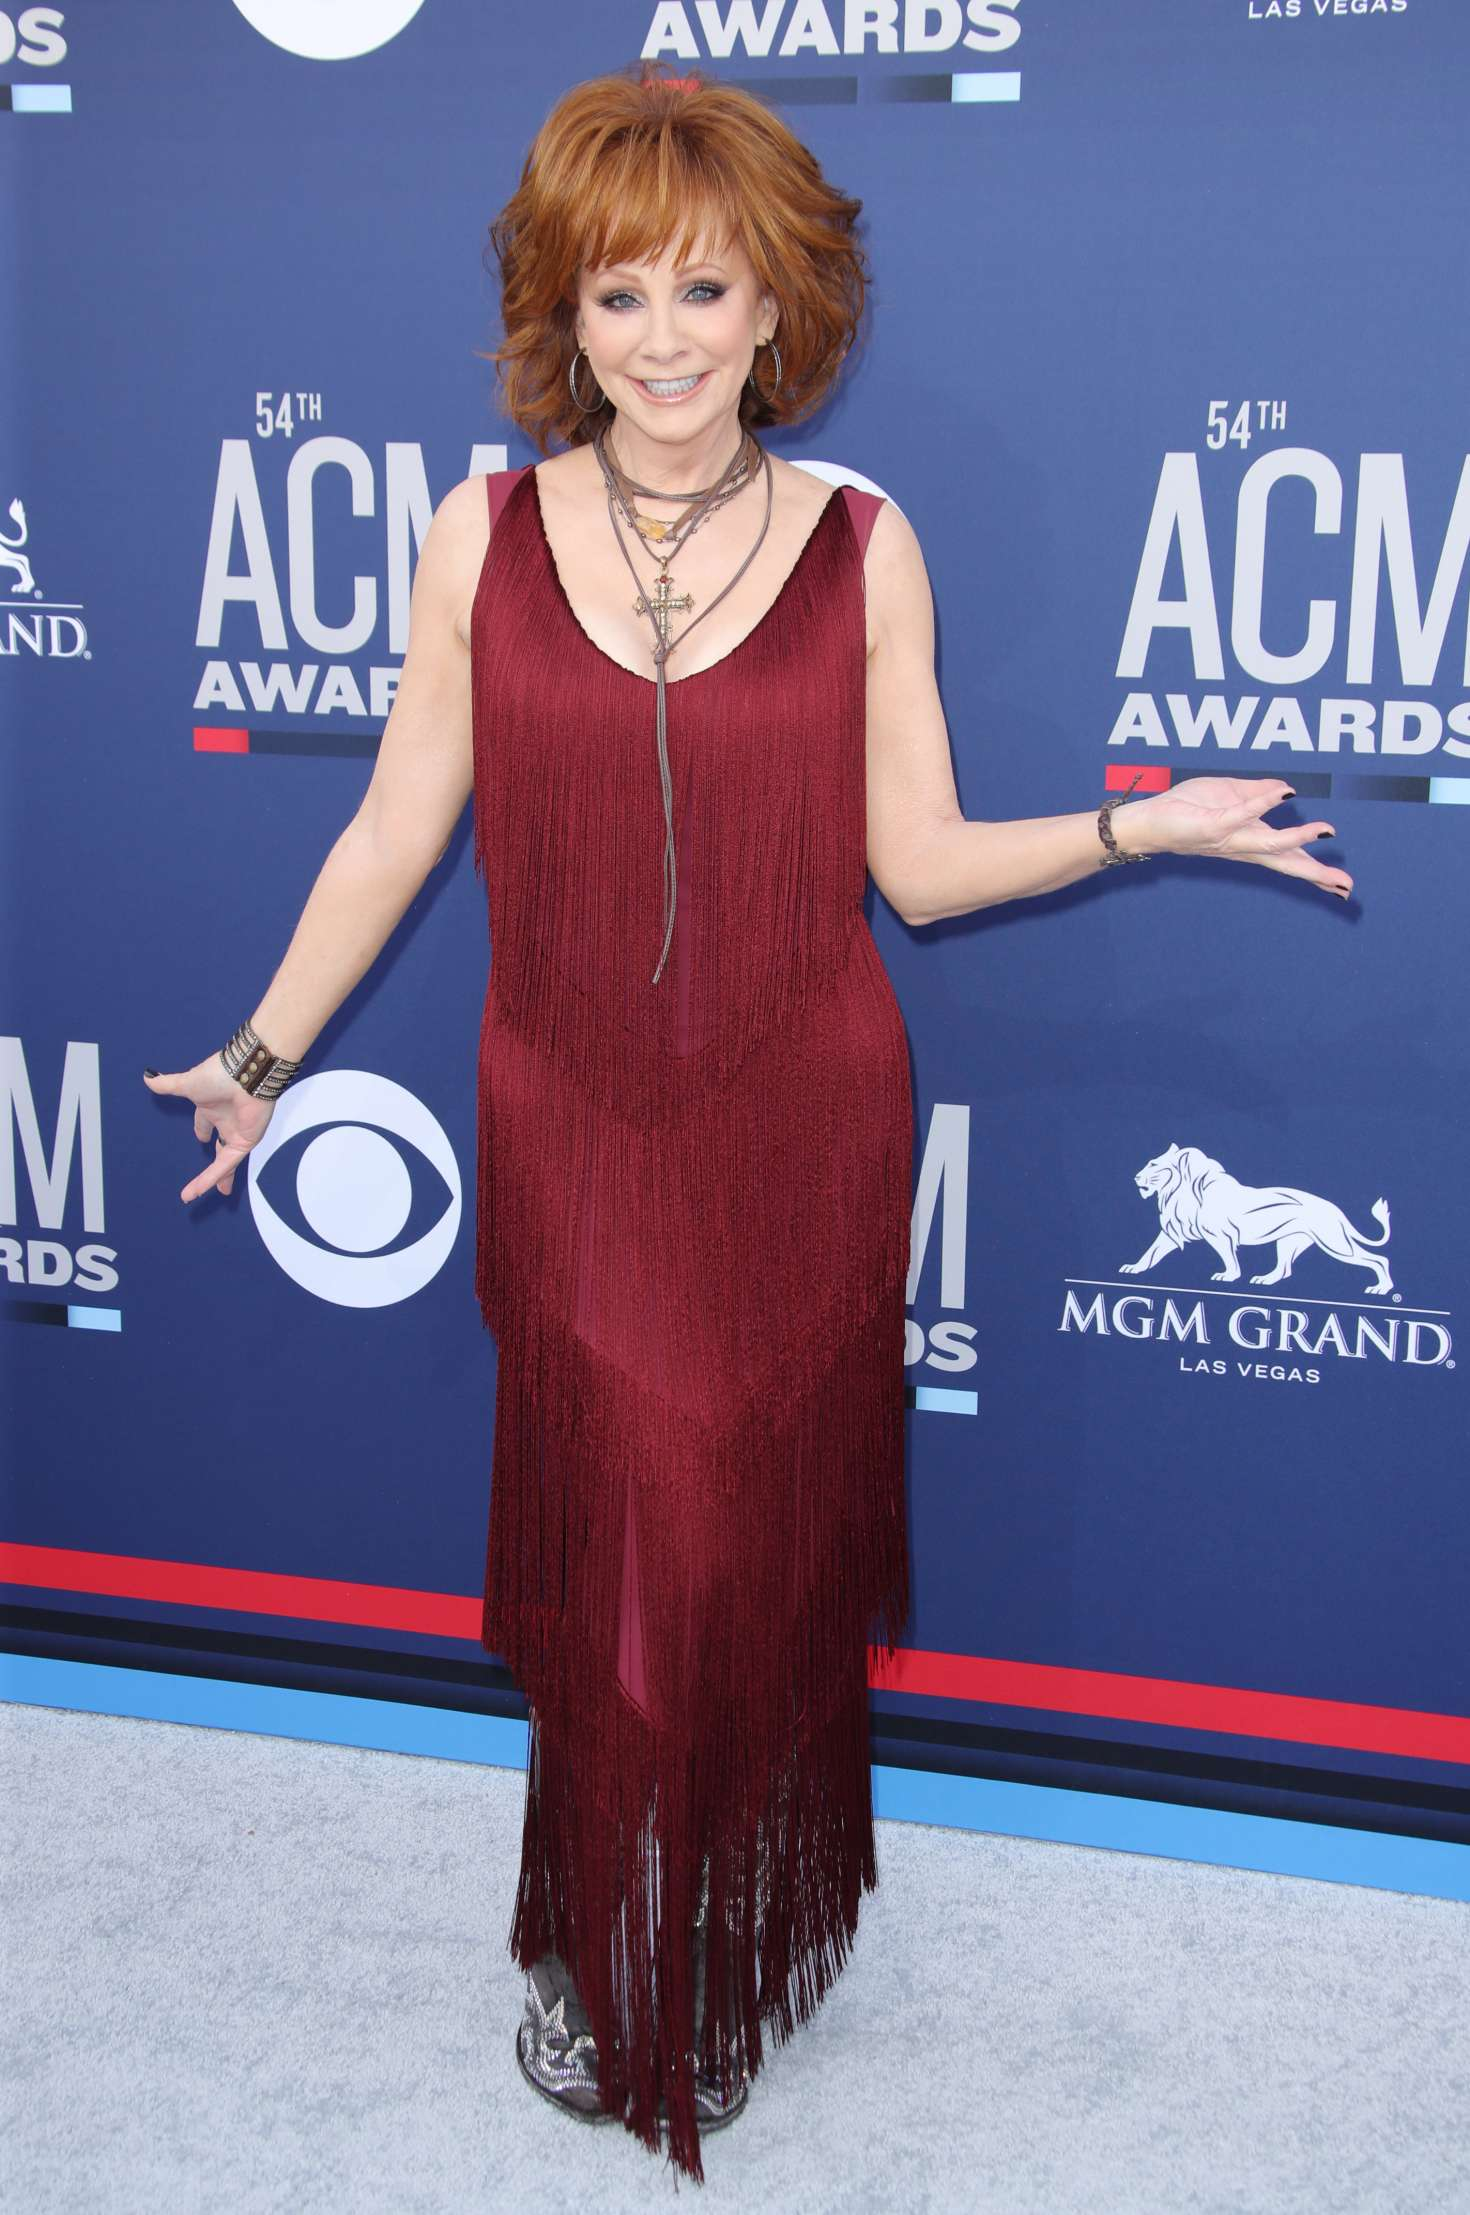 Reba Mcentire 2019 : Reba McEntire: 2019 Academy of Country Music Awards -05